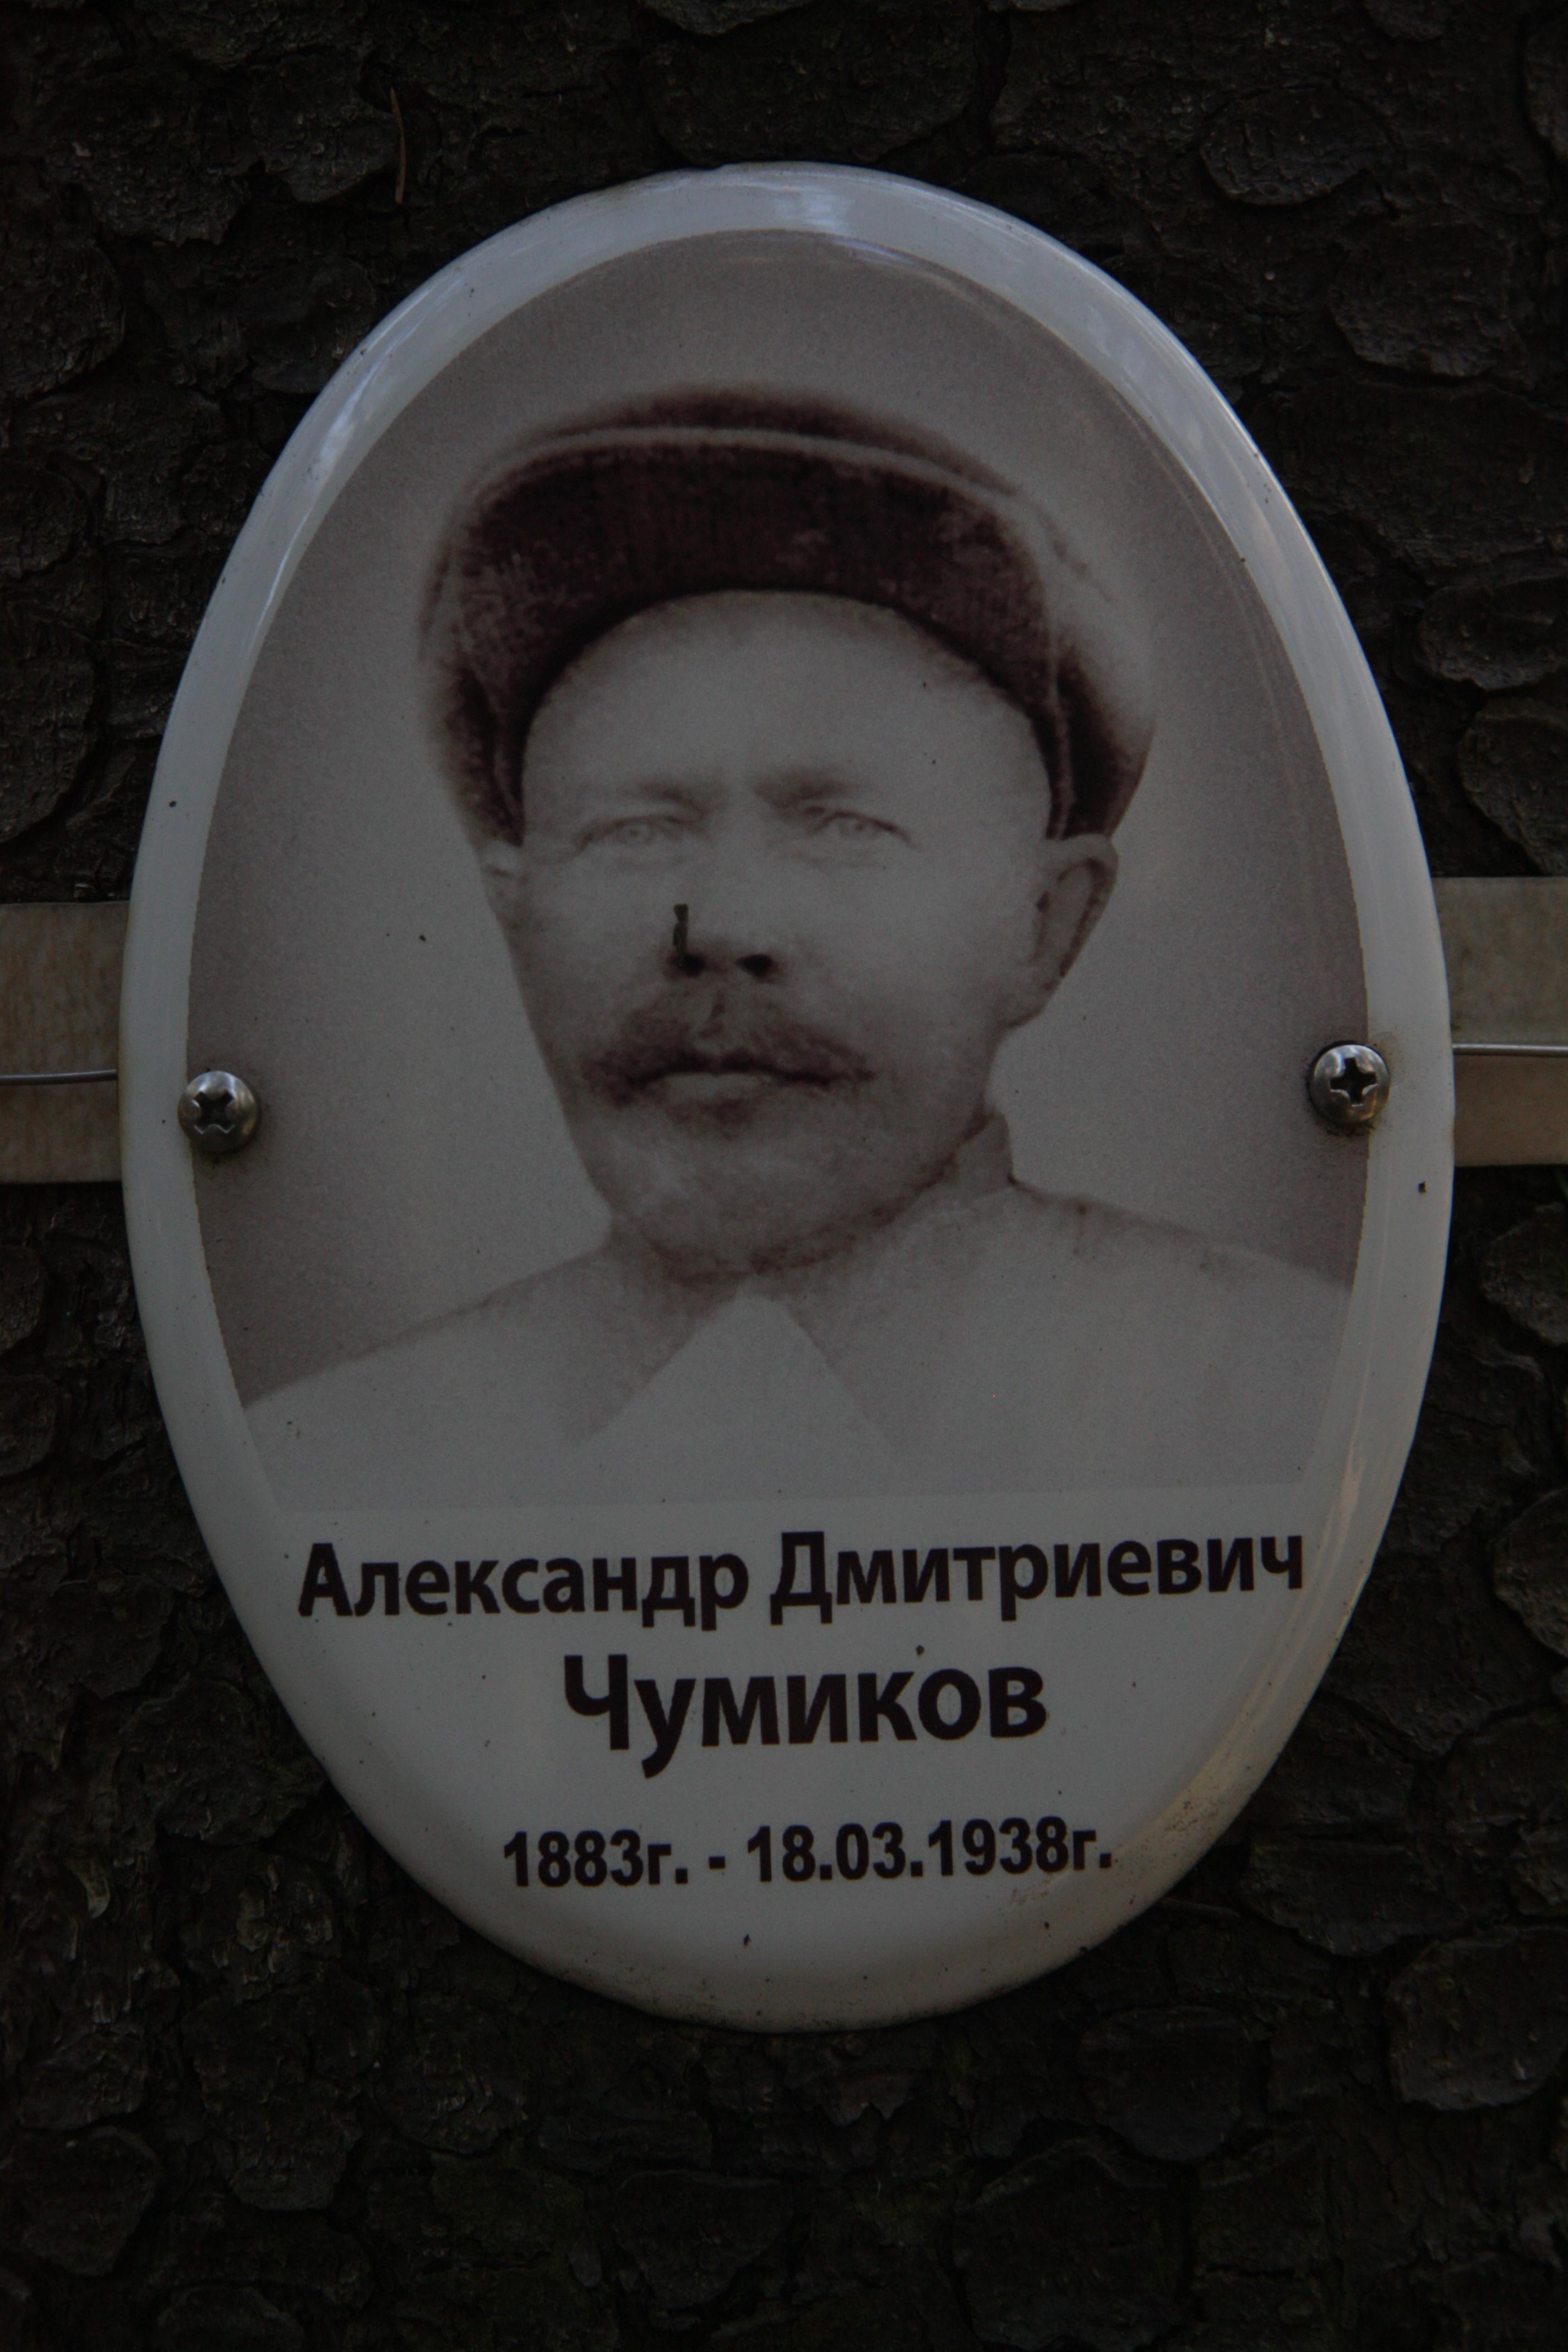 Памятная табличка А. Д. Чумикову. Фото 18.05.2017